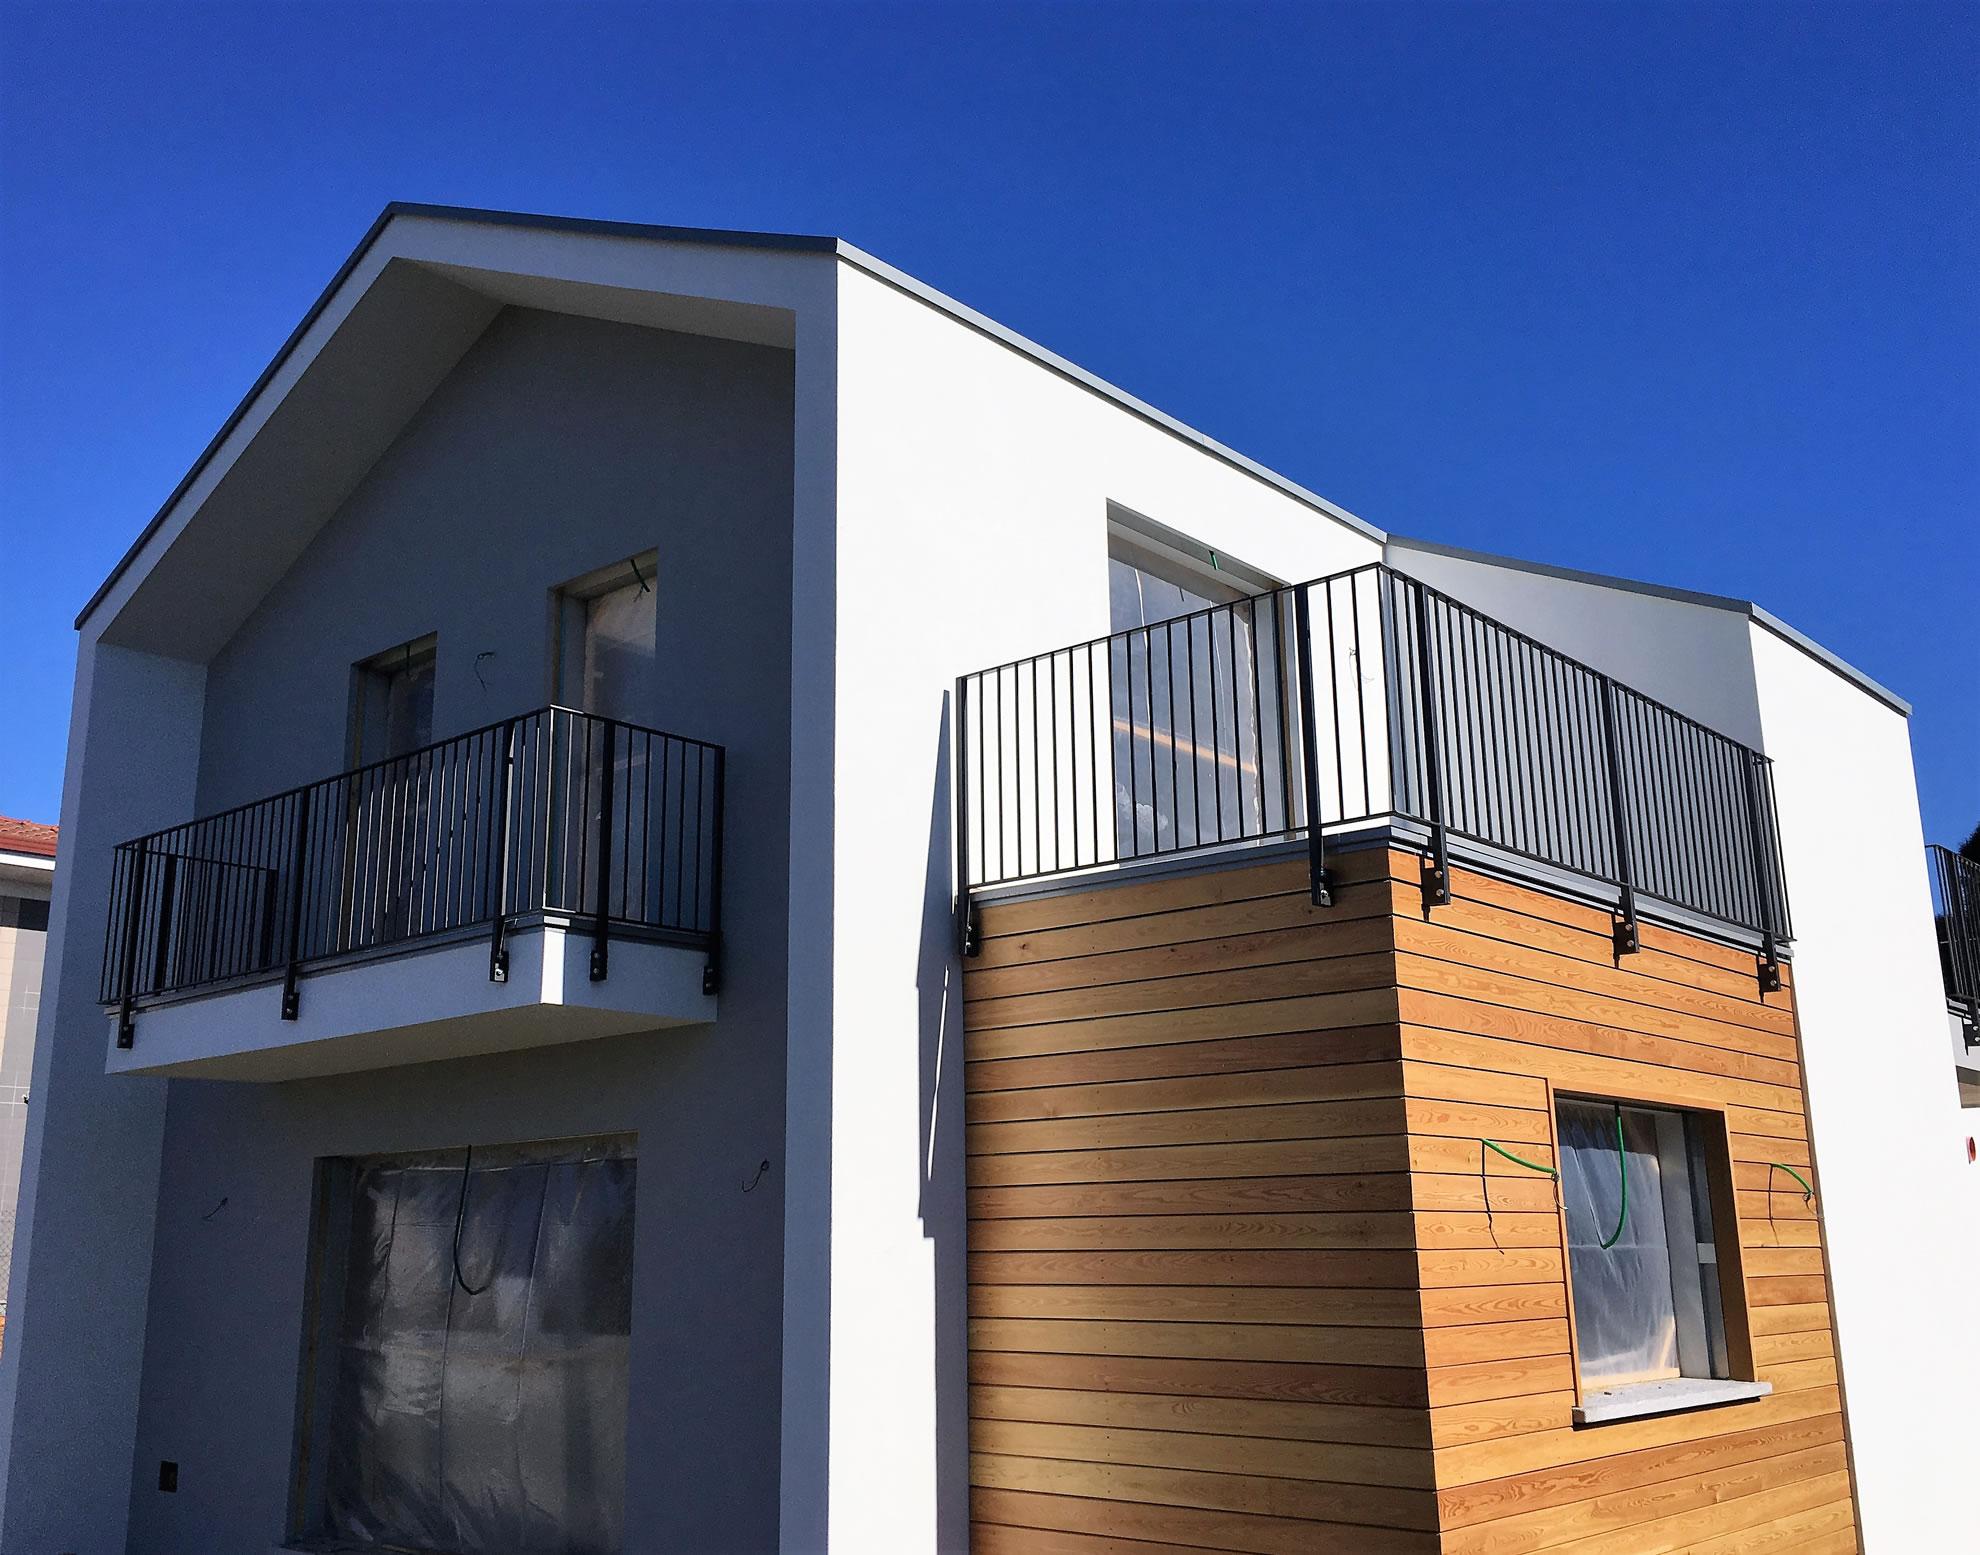 casa-xlam-ms-momo_ferraro-case-in-legno_2017-03-10 10.22.08 (2)